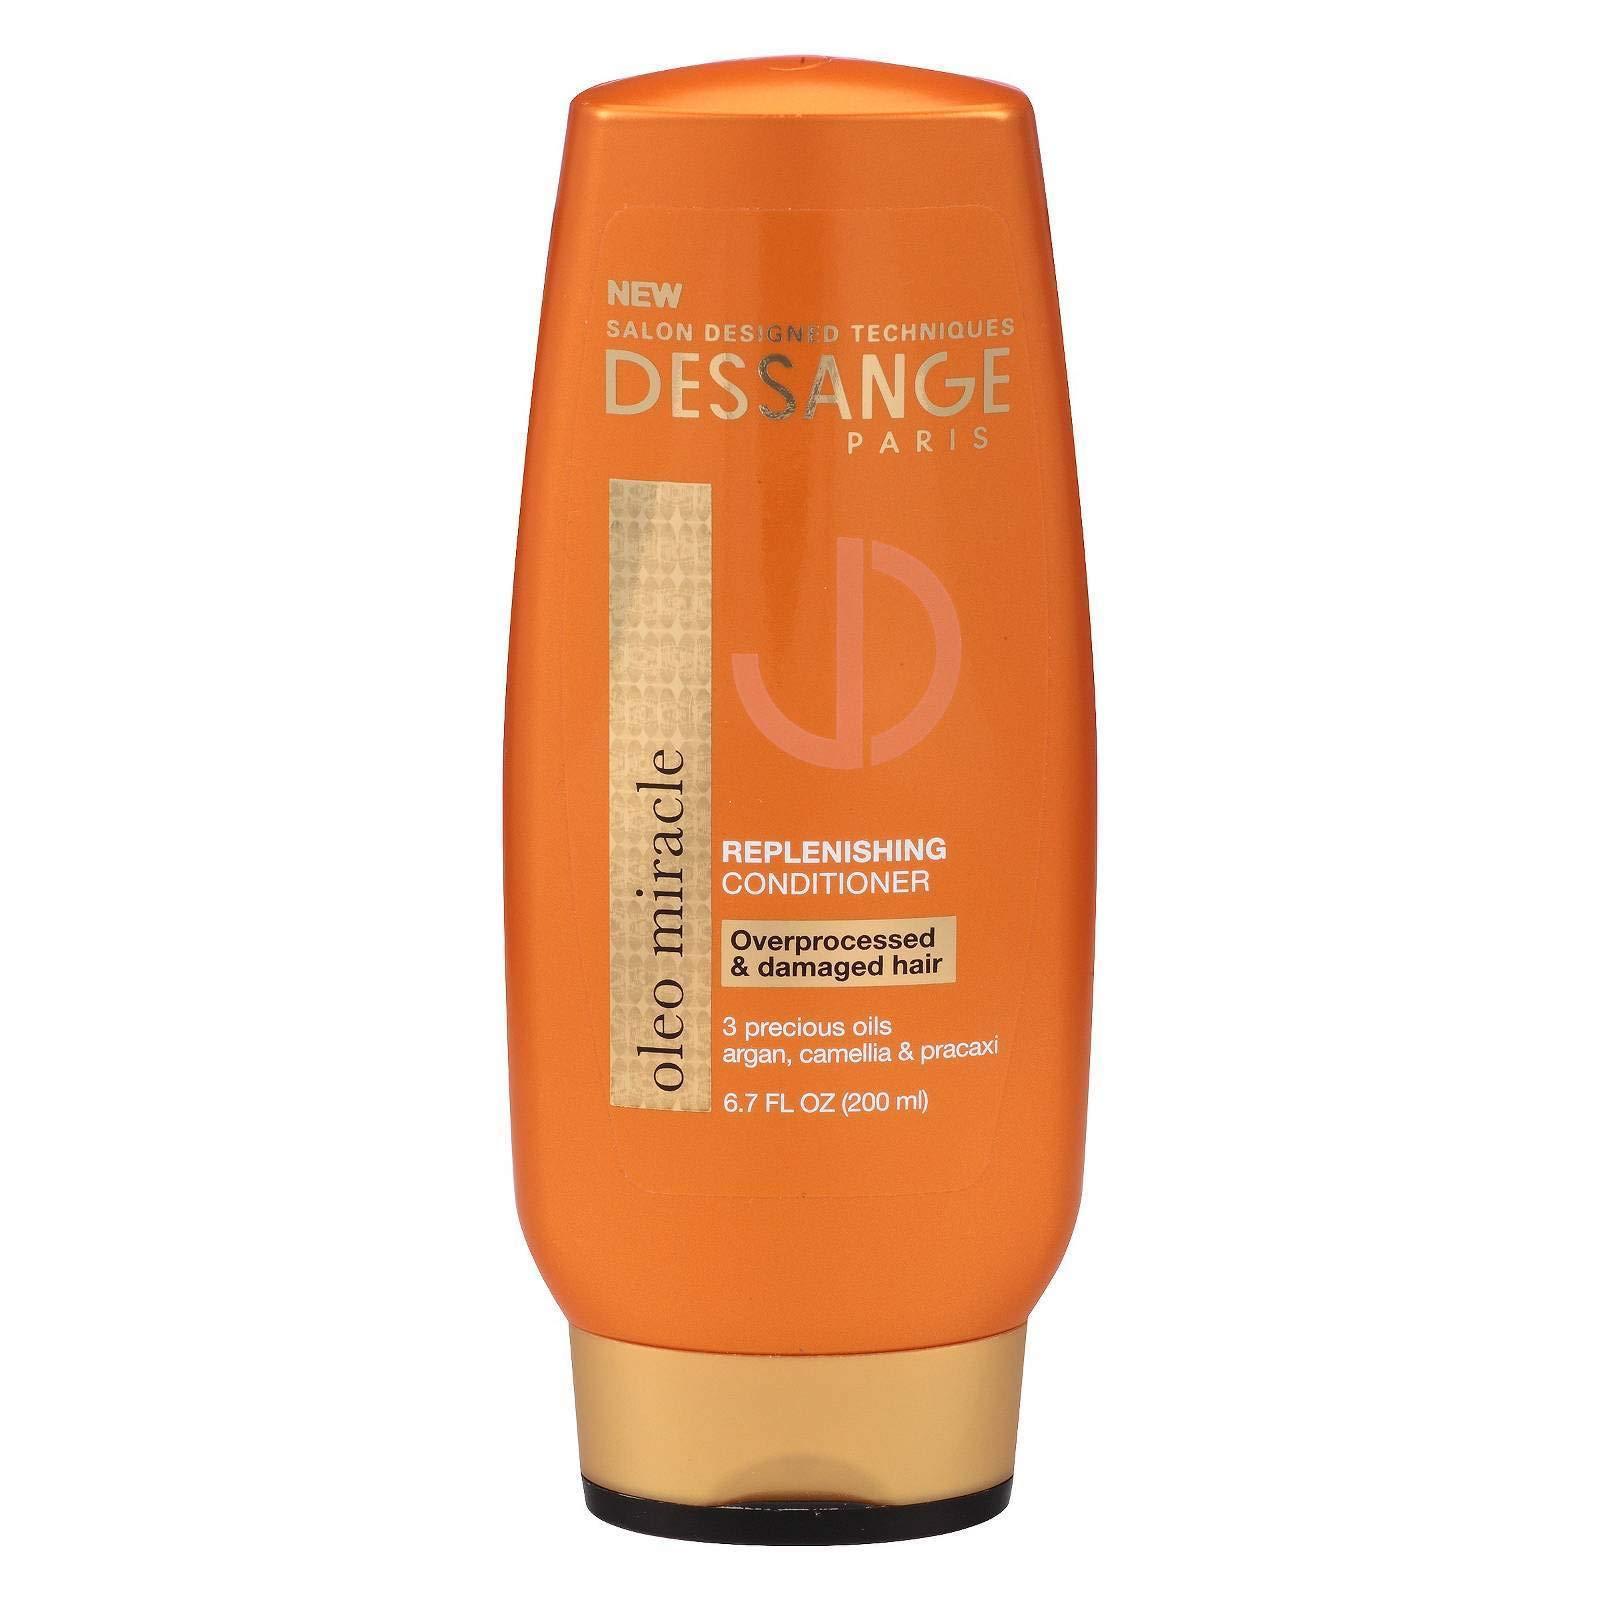 Dessange Paris Oleo Miracle Replenishing Conditioner- 6.7 Oz